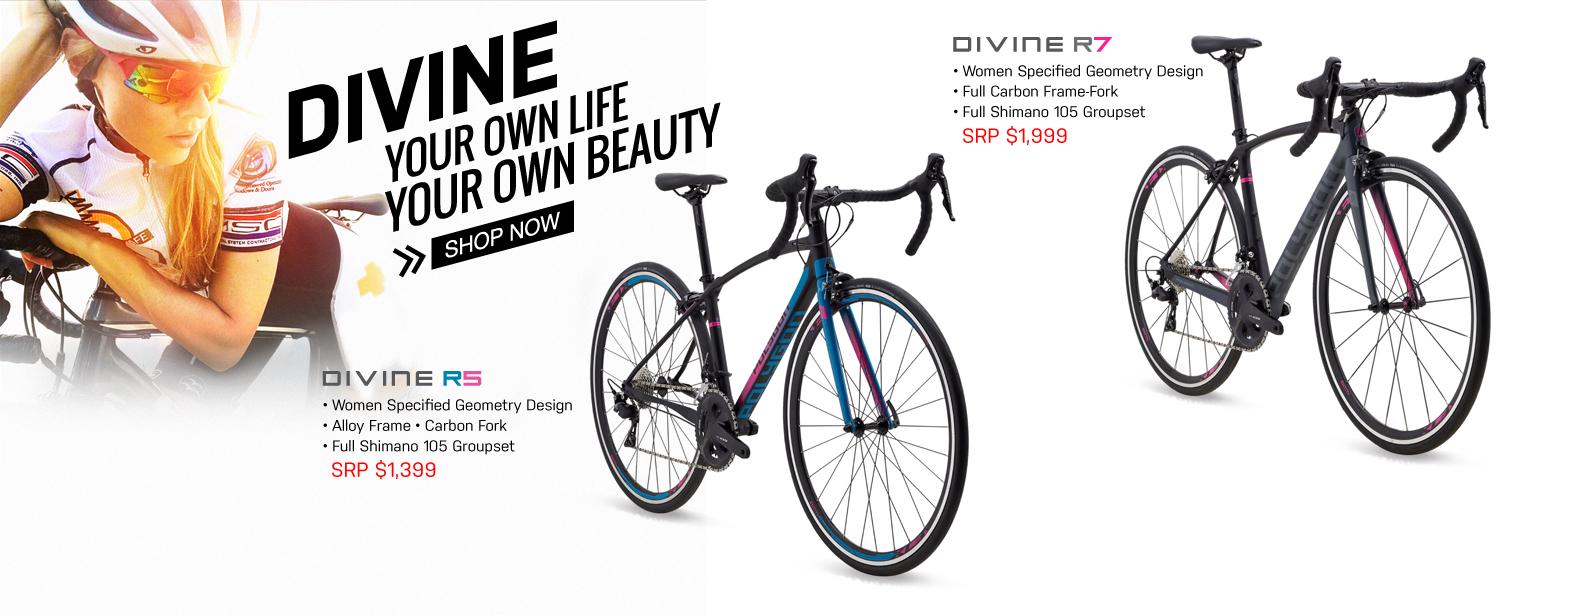 Polygon Divine Road Bike Series